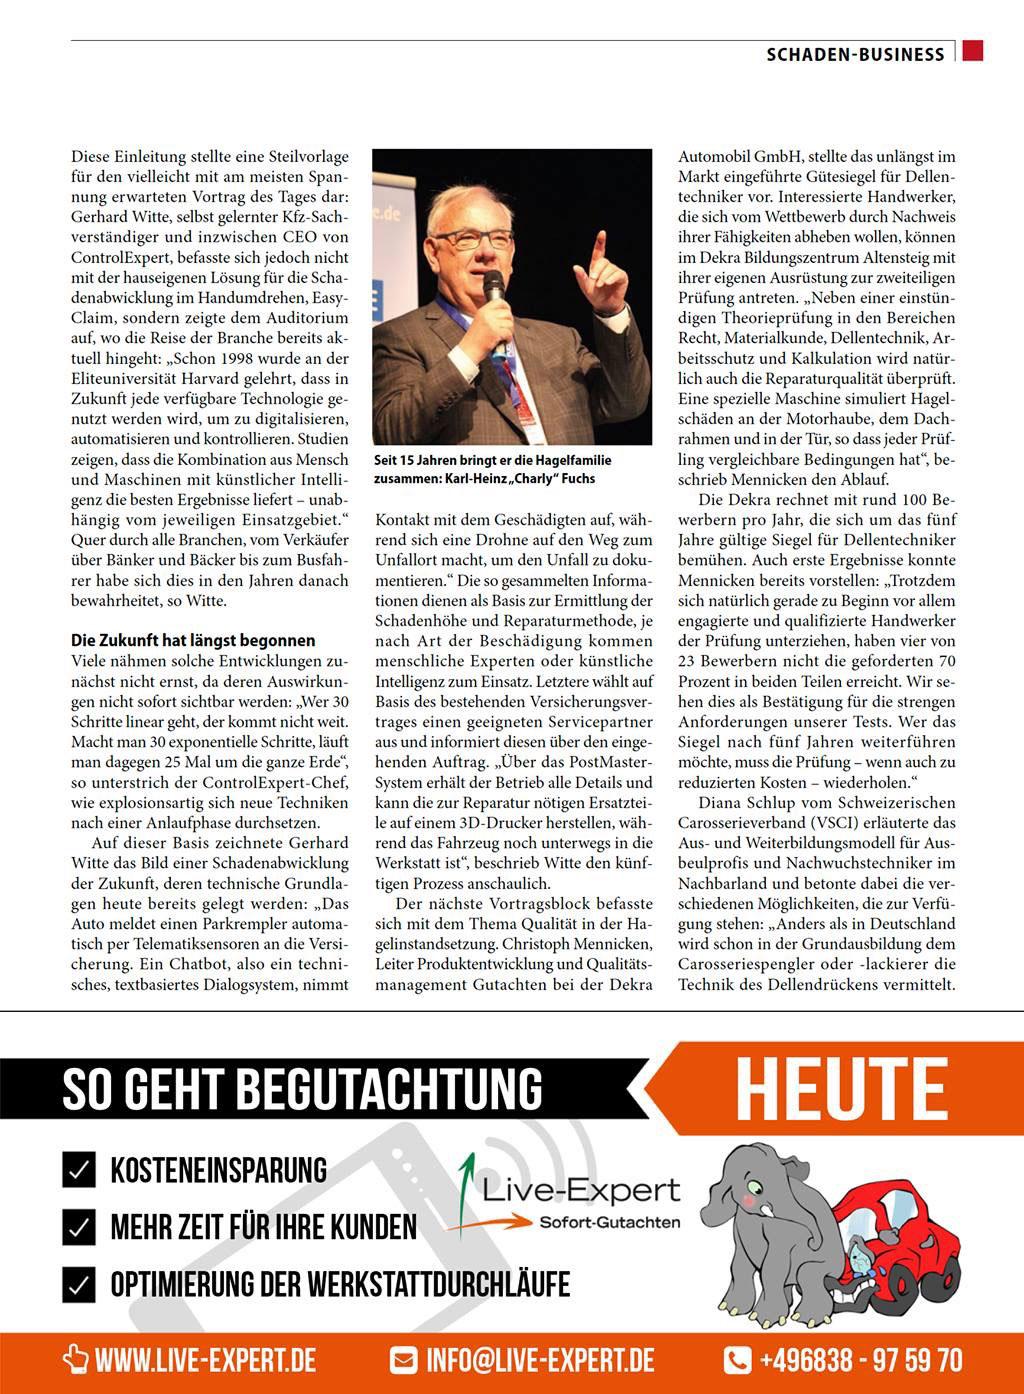 hsz-news-hagel-akademie-esslingen-bericht-autohaus-magazin-2017-02